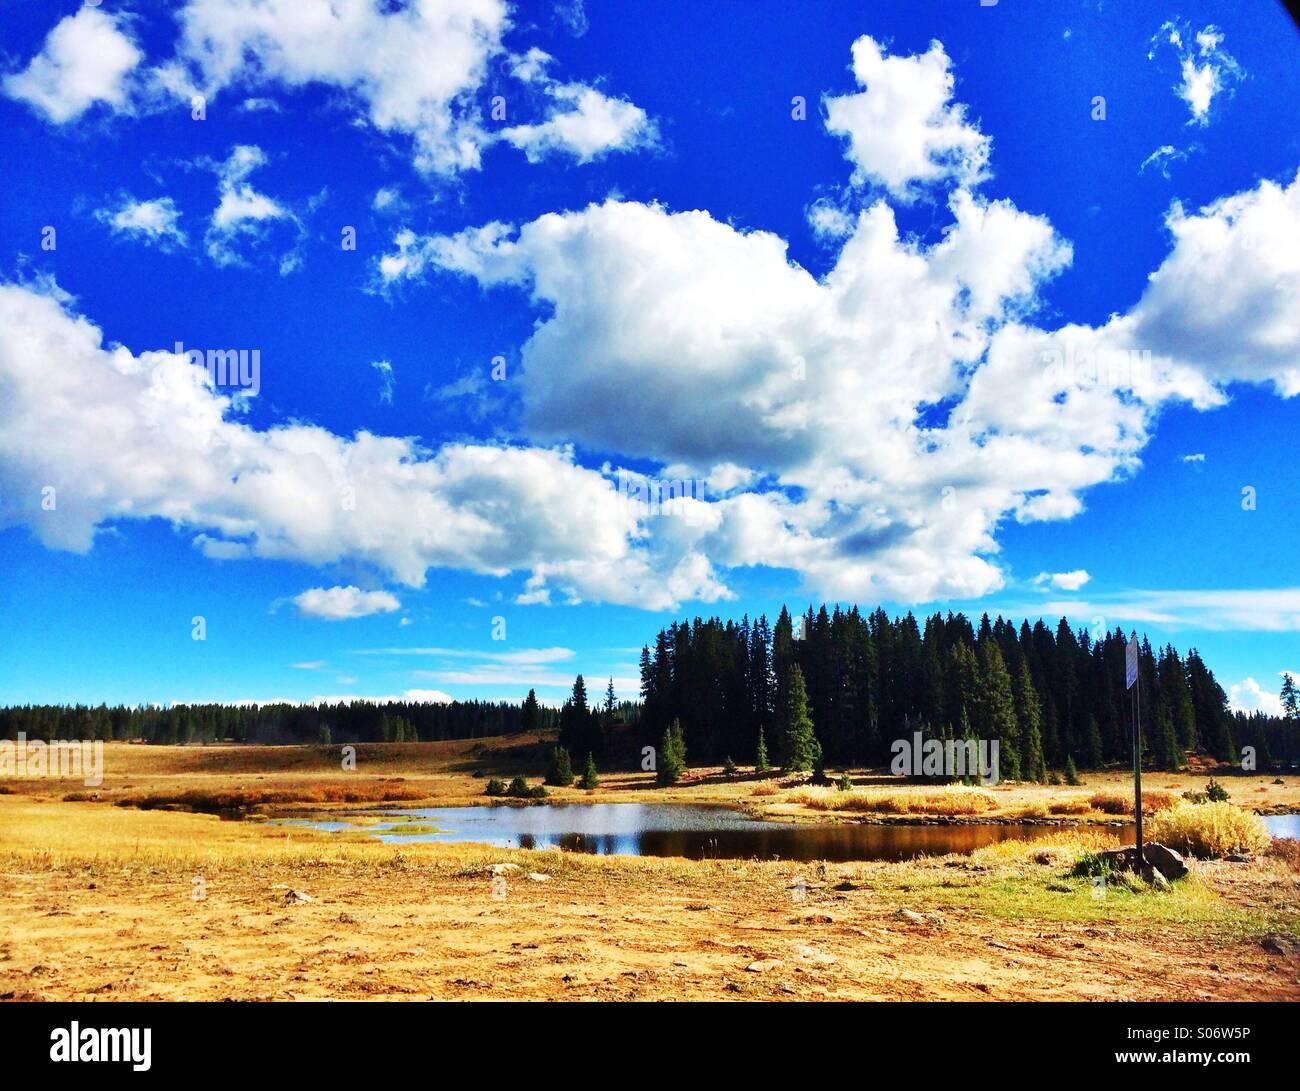 Mesa lakes - Stock Image